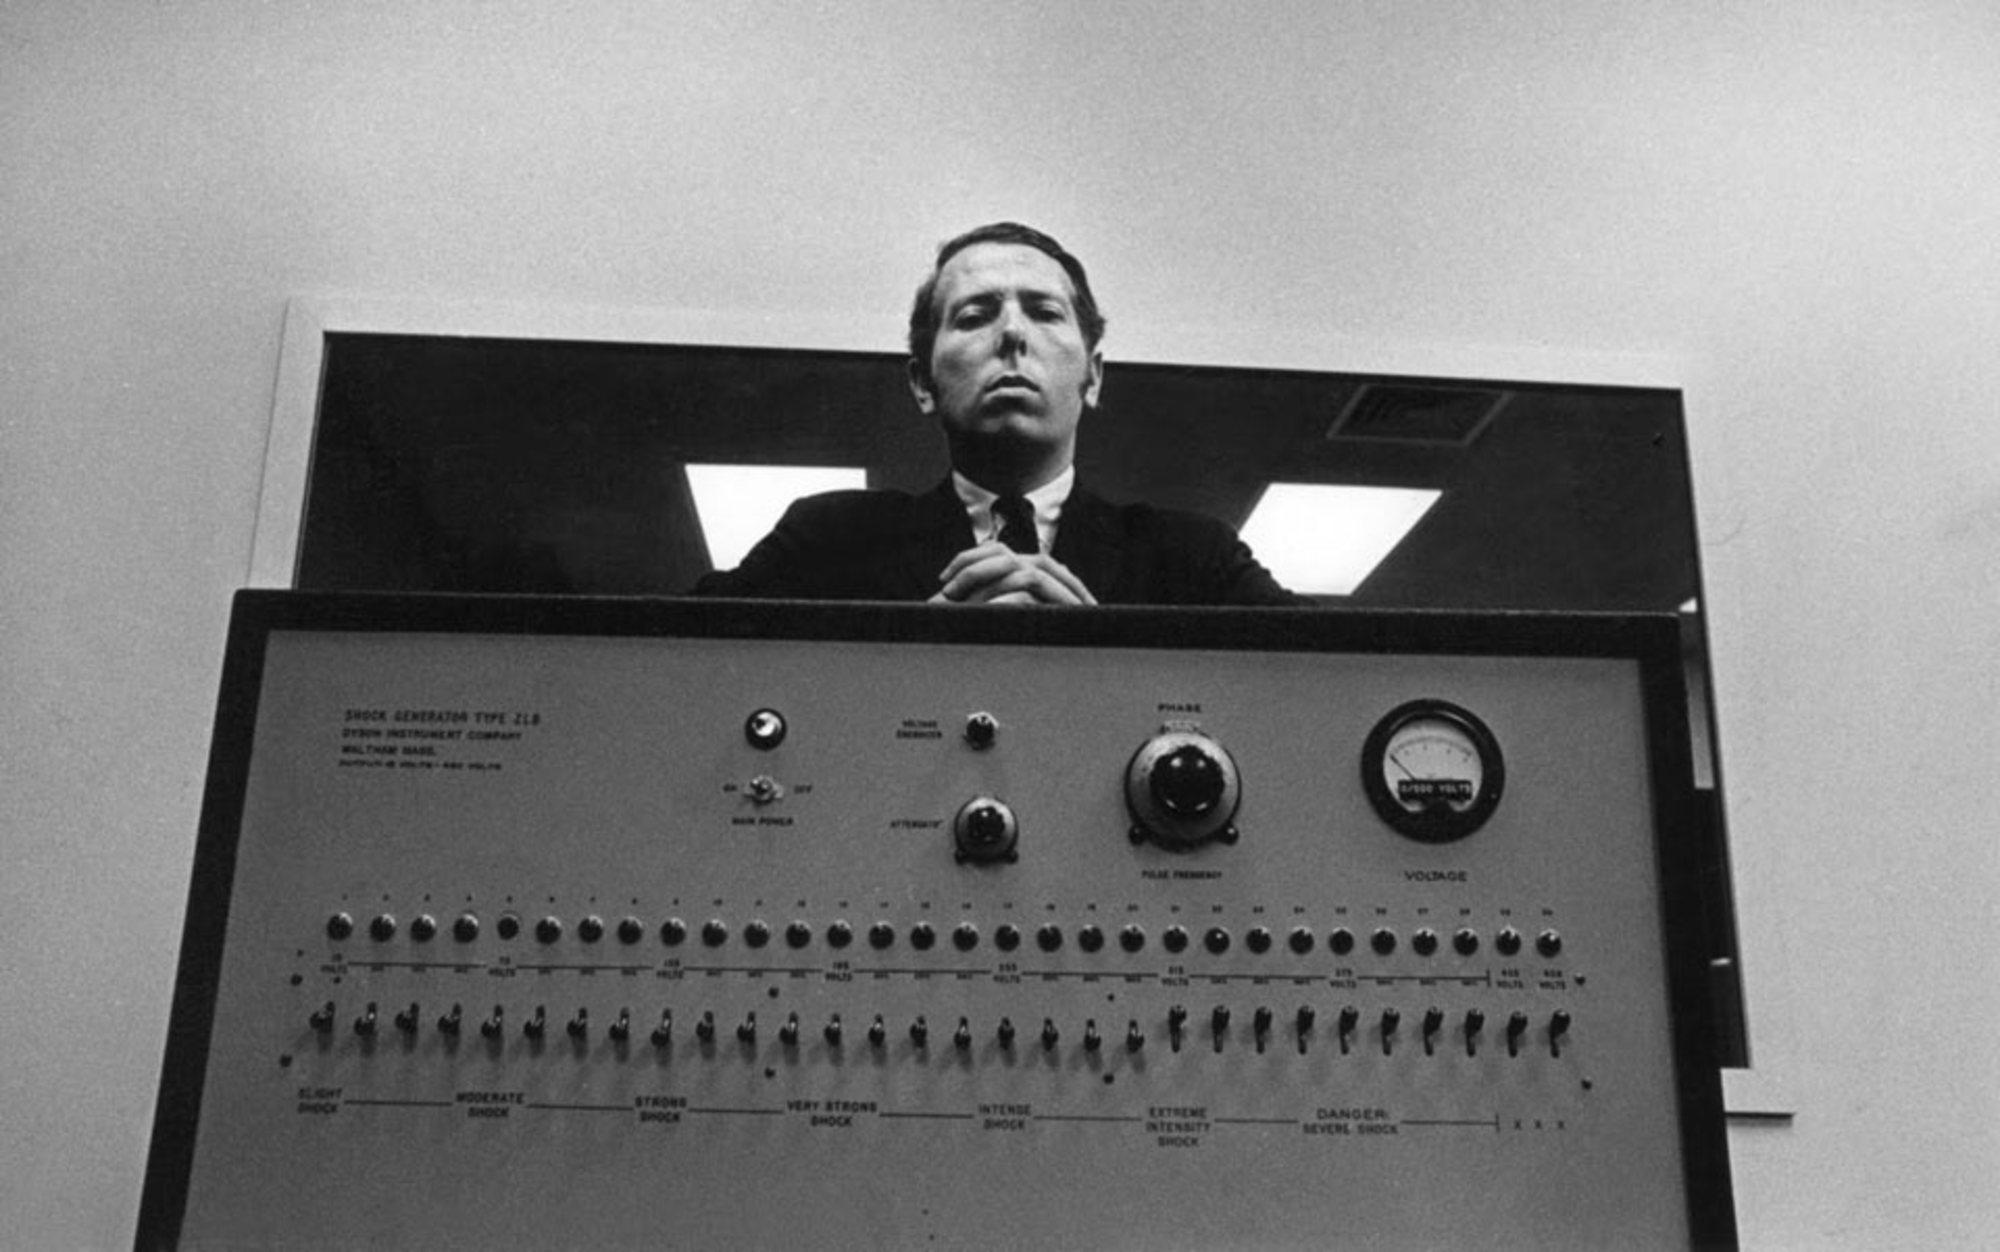 Ripetere l'esperimento Milgram 50 anni dopo